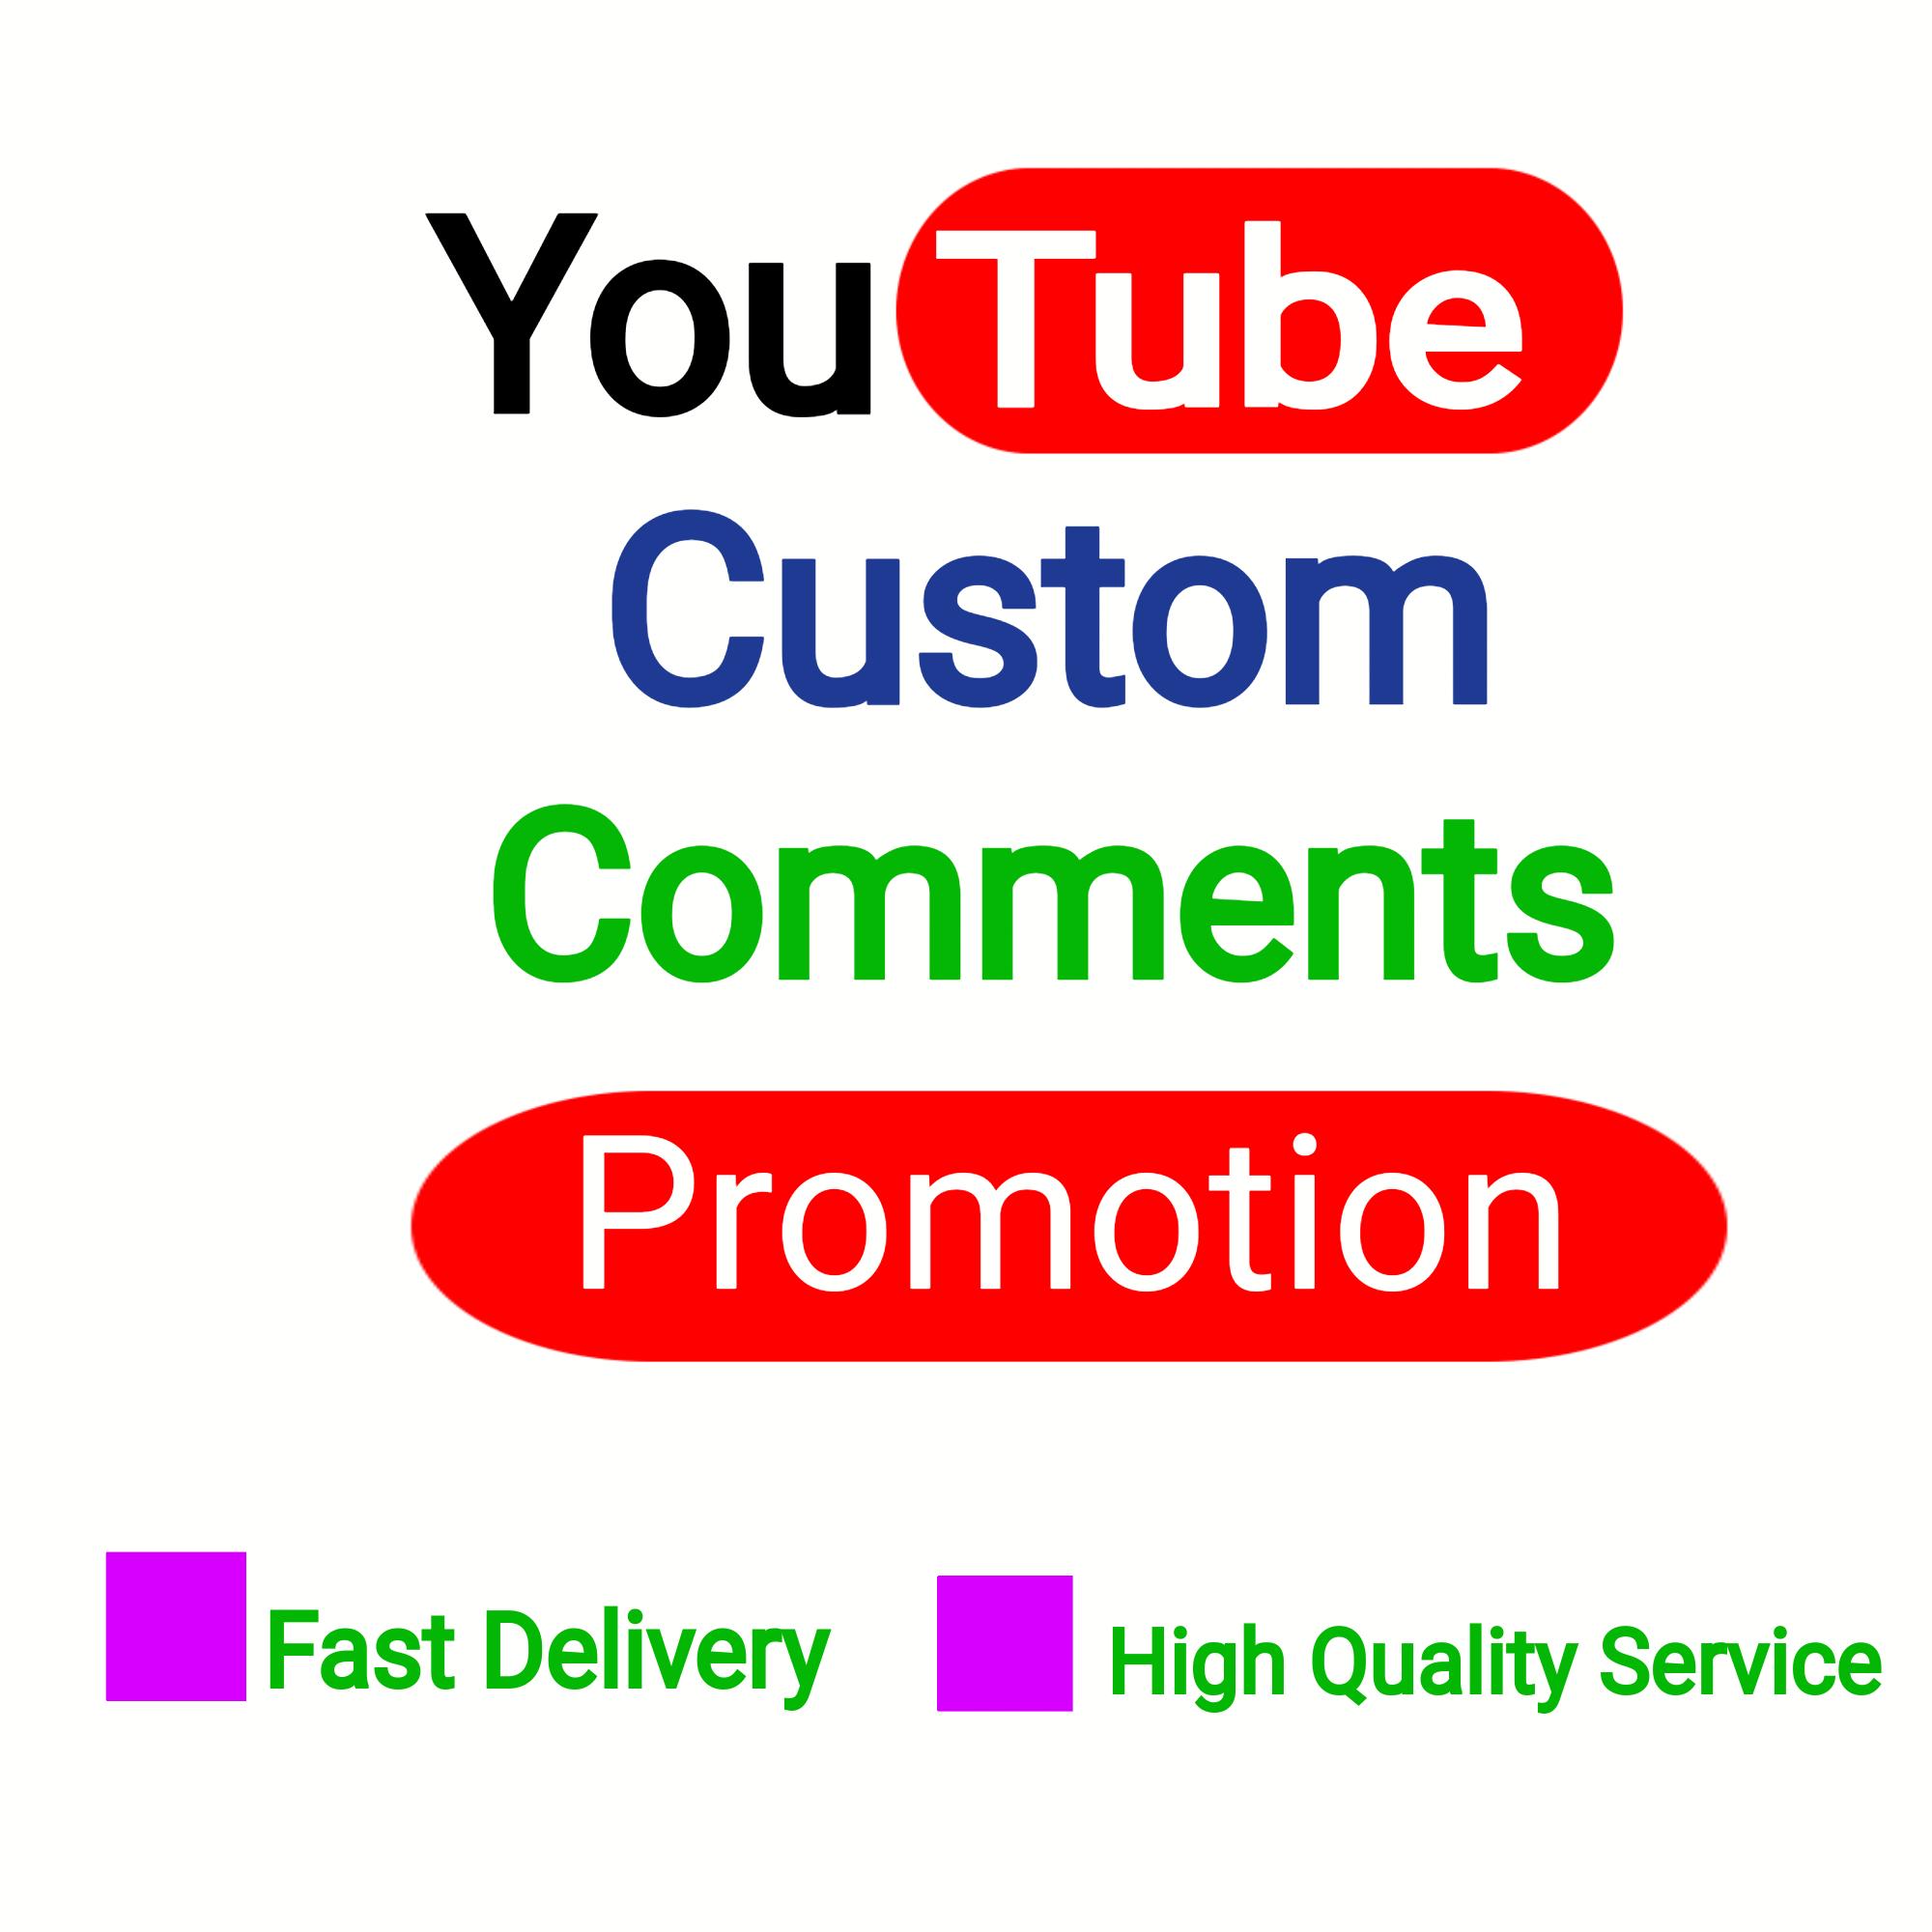 Y0U-TUBE Video Promotion Nondrop Lifetime Guarantee